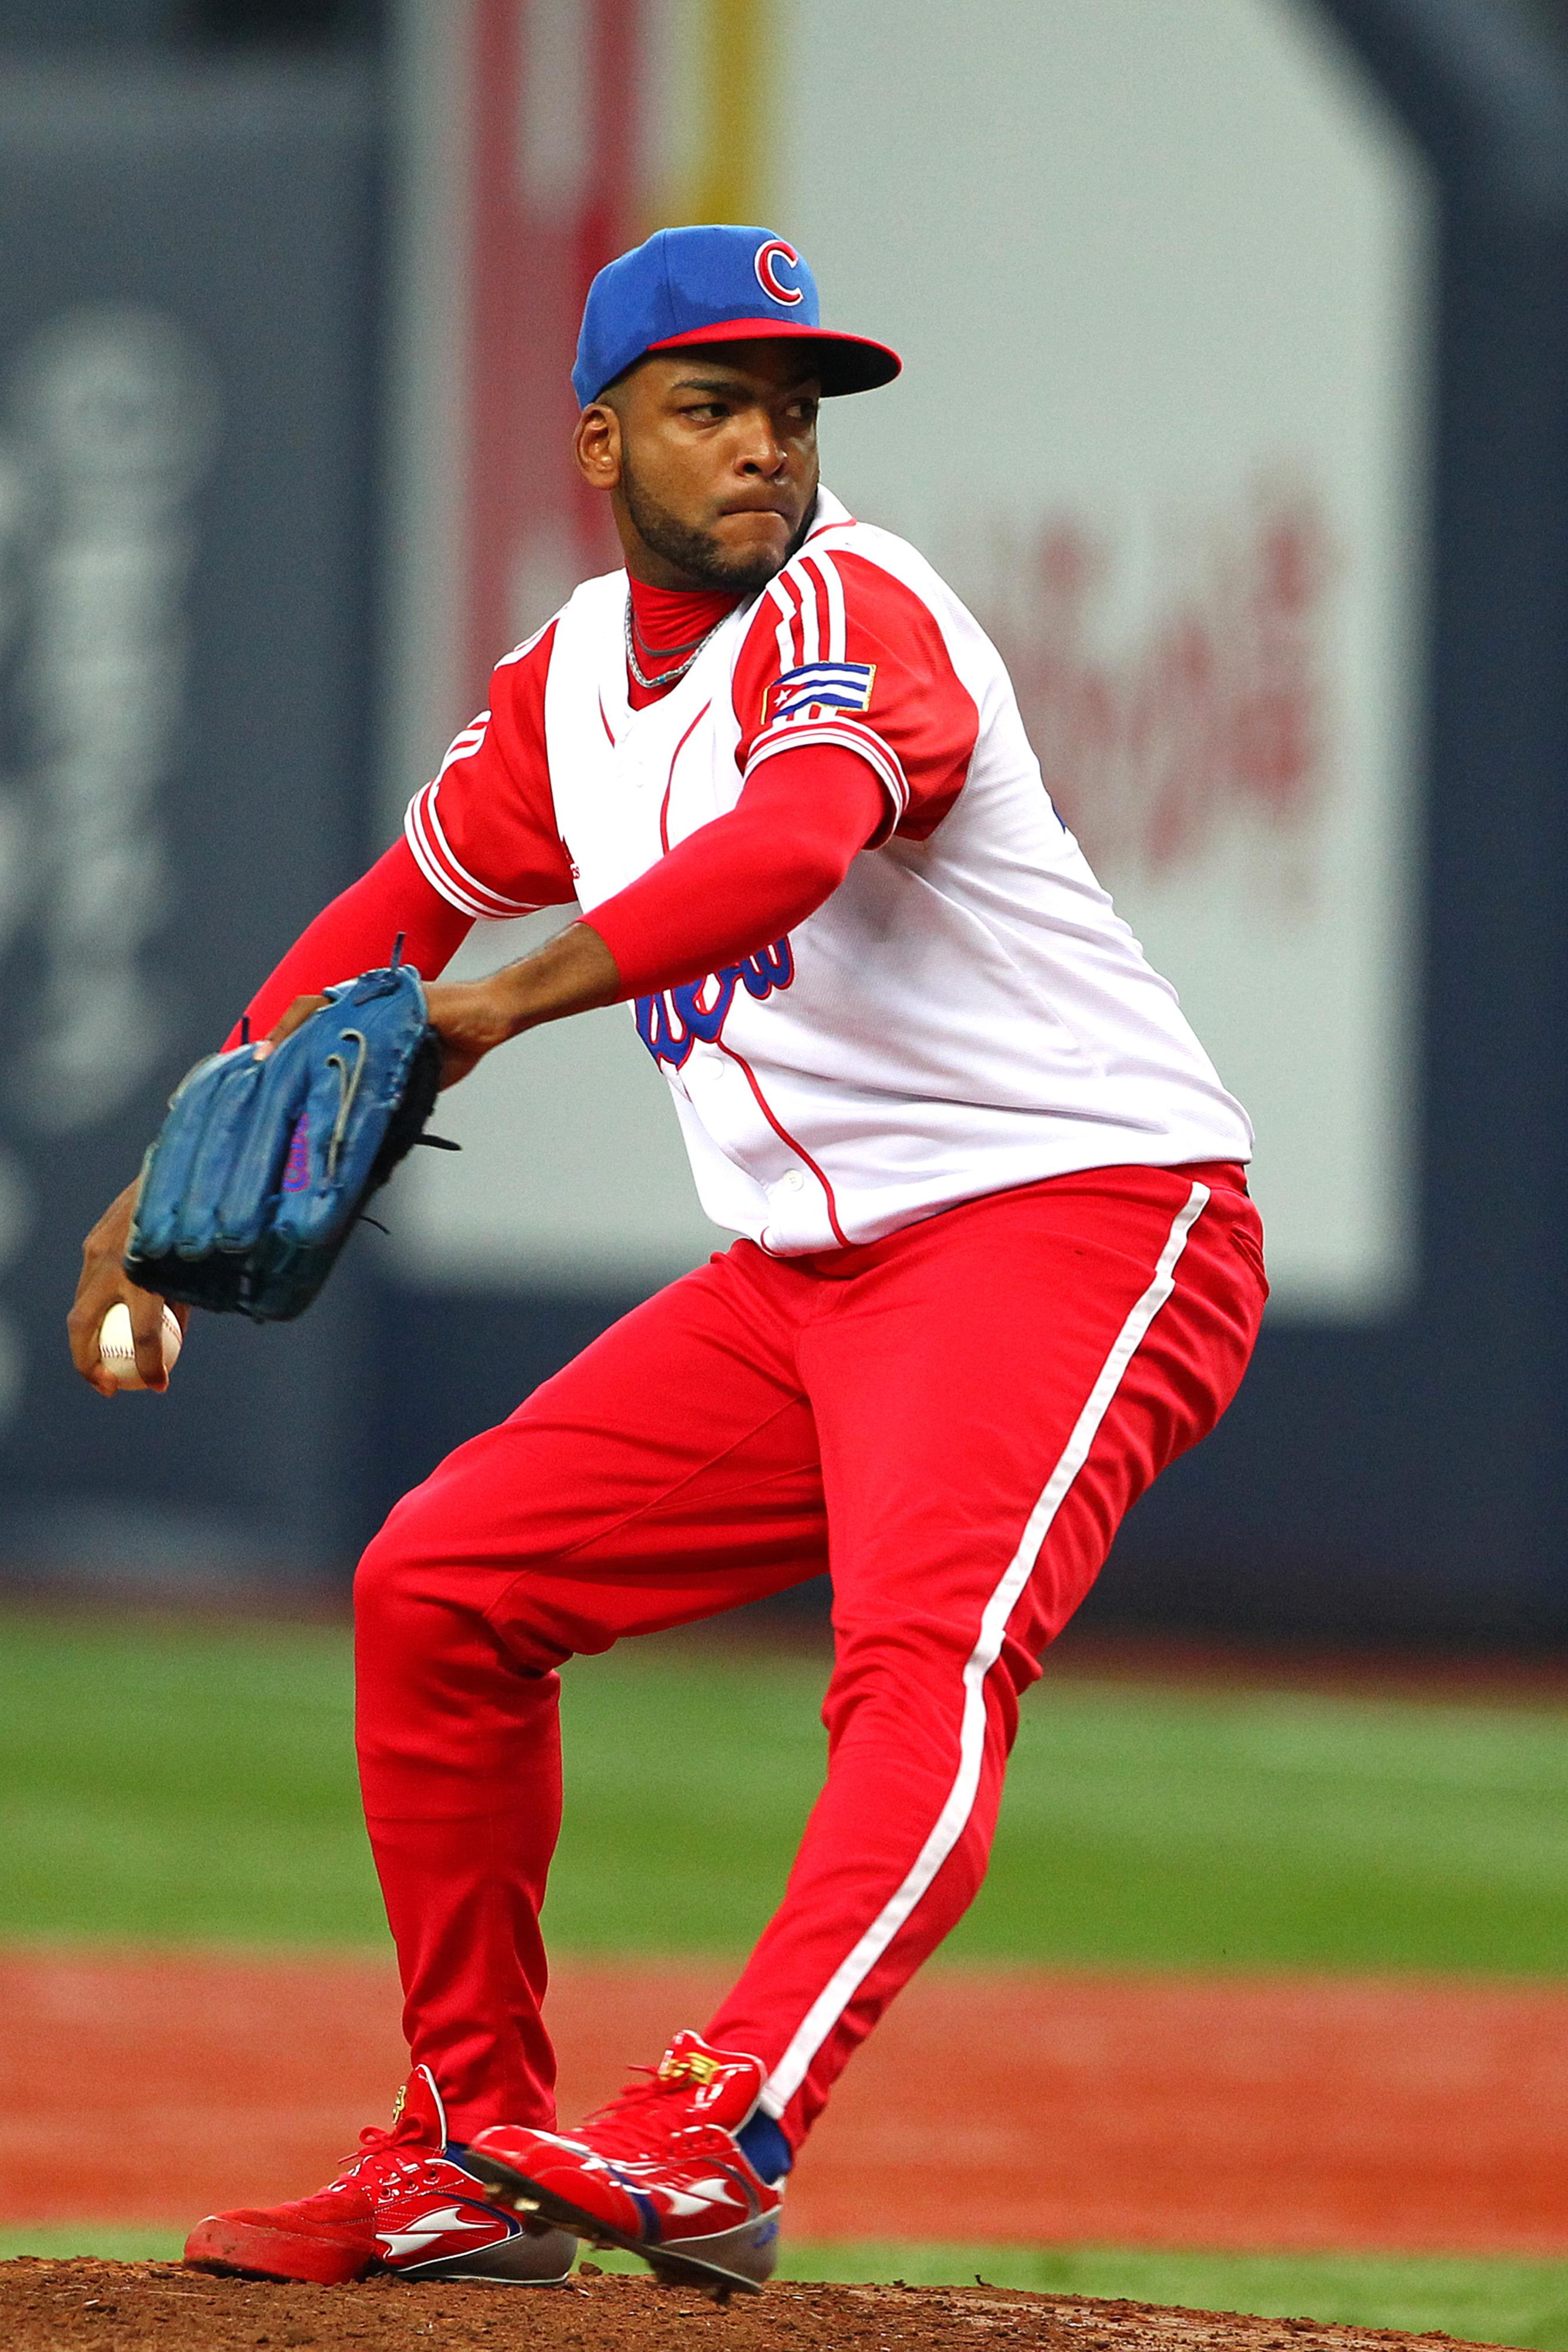 Cuban pitcher Odrisamer Despaigne to have showcase for MLB teams